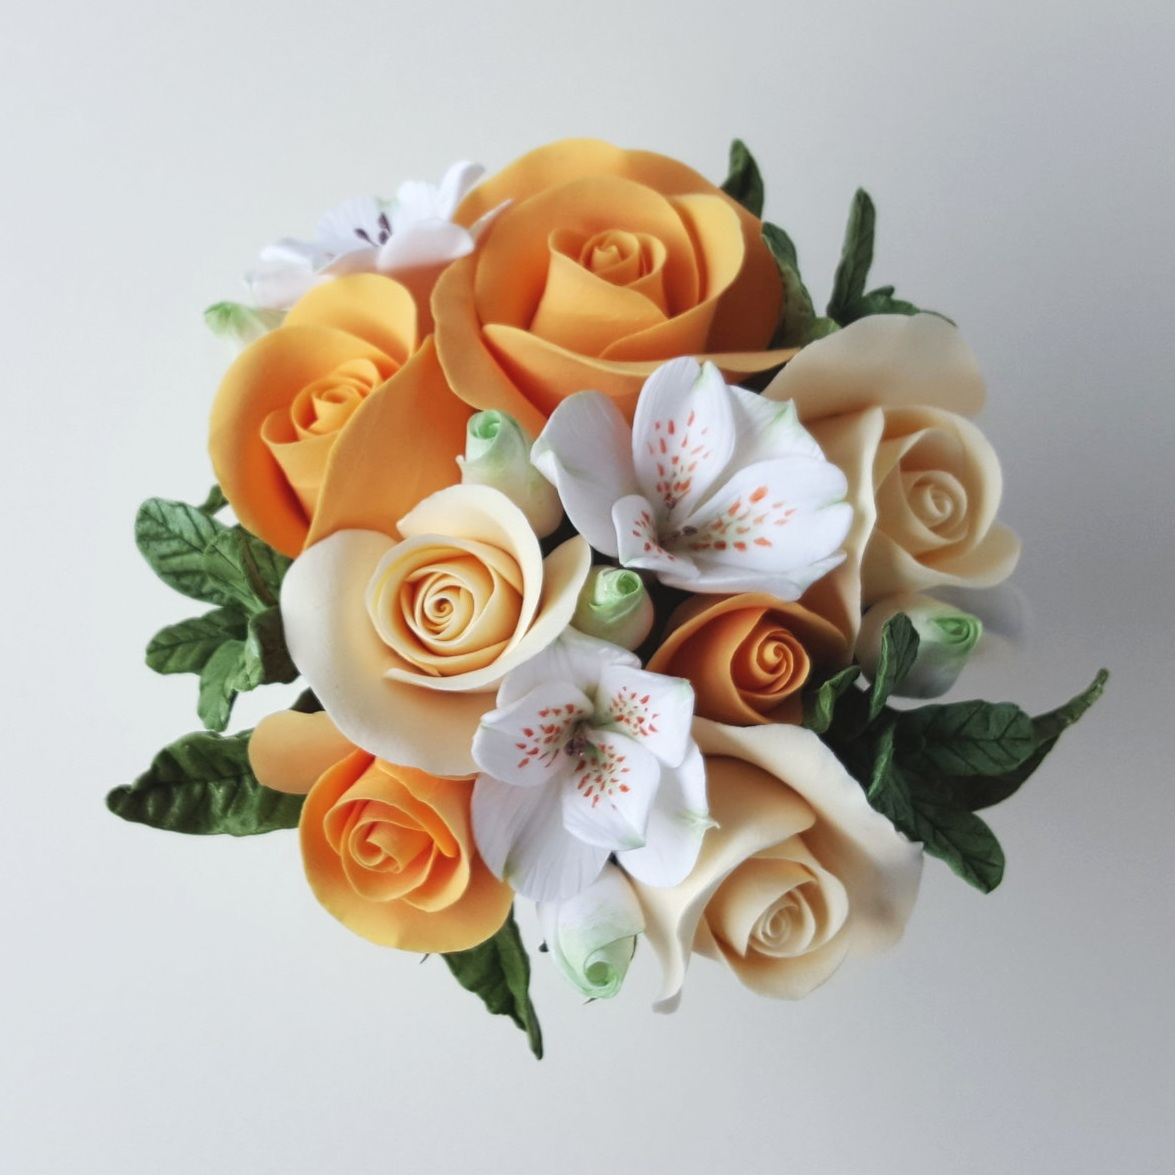 Floral Arrangements & Gifts